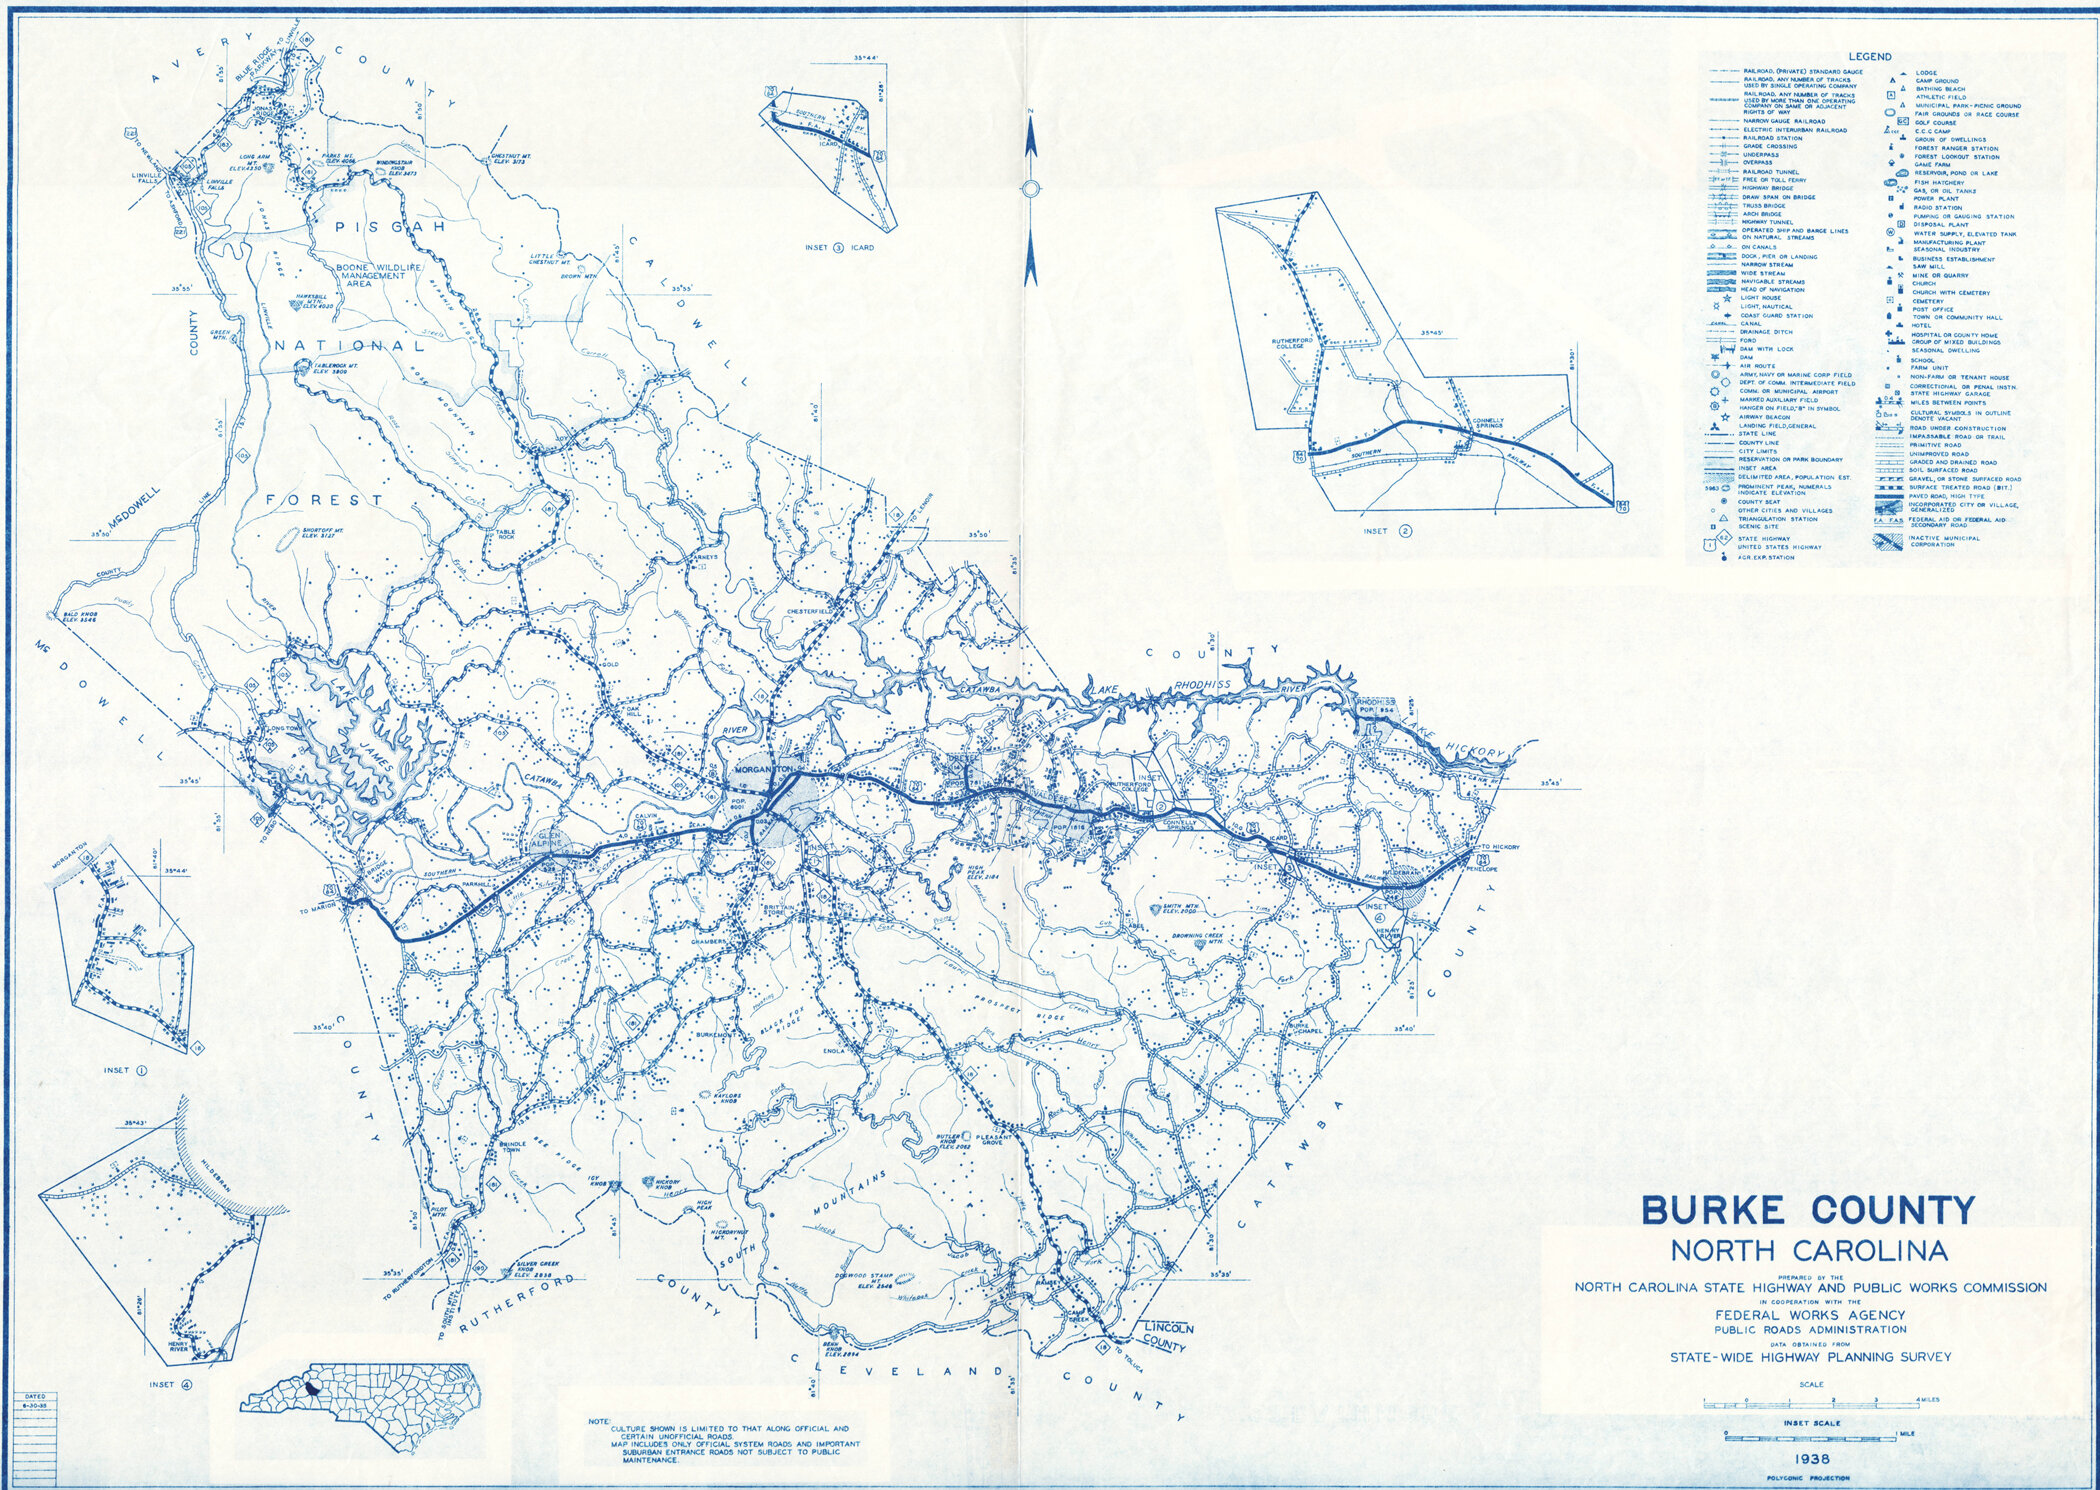 Burke_County_Road_Map_1938.jpg